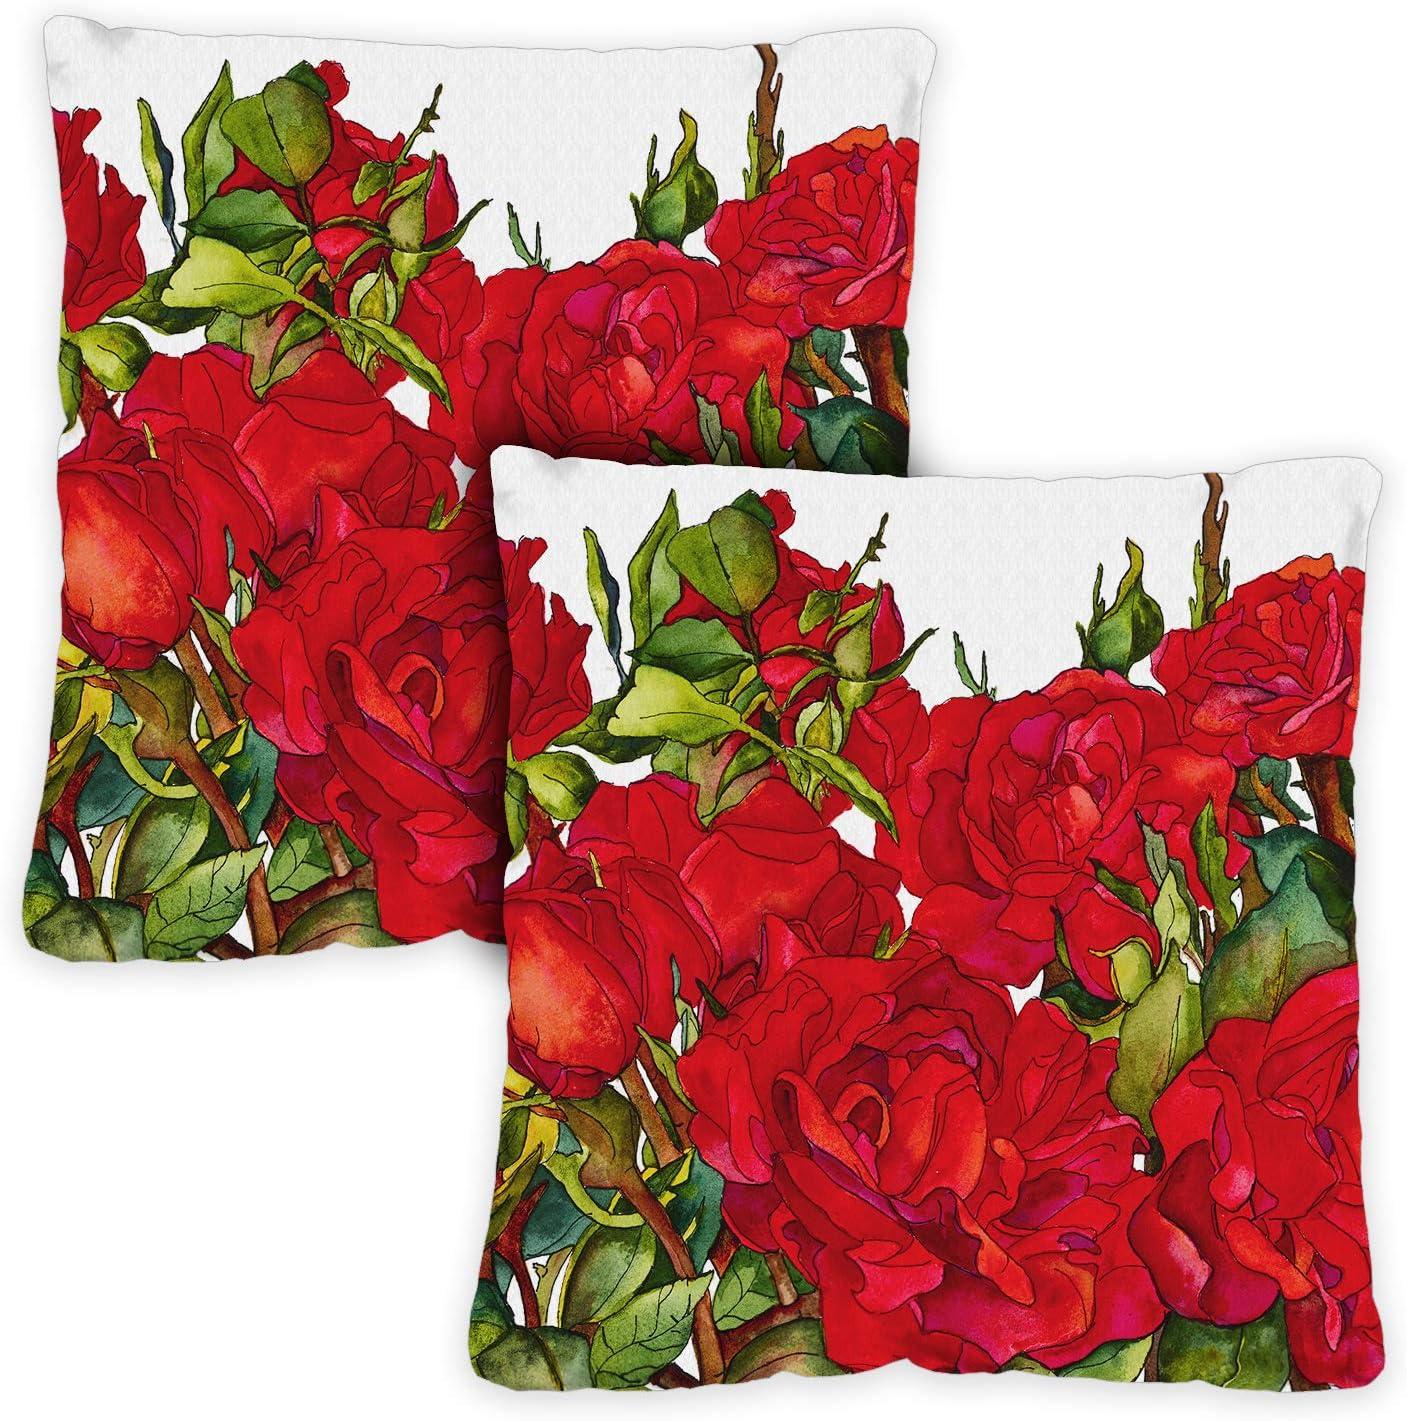 Toland Home Garden Rosette Blooms 18 x 18 Inch Indoor/Outdoor, Pillow Case (2-Pack)